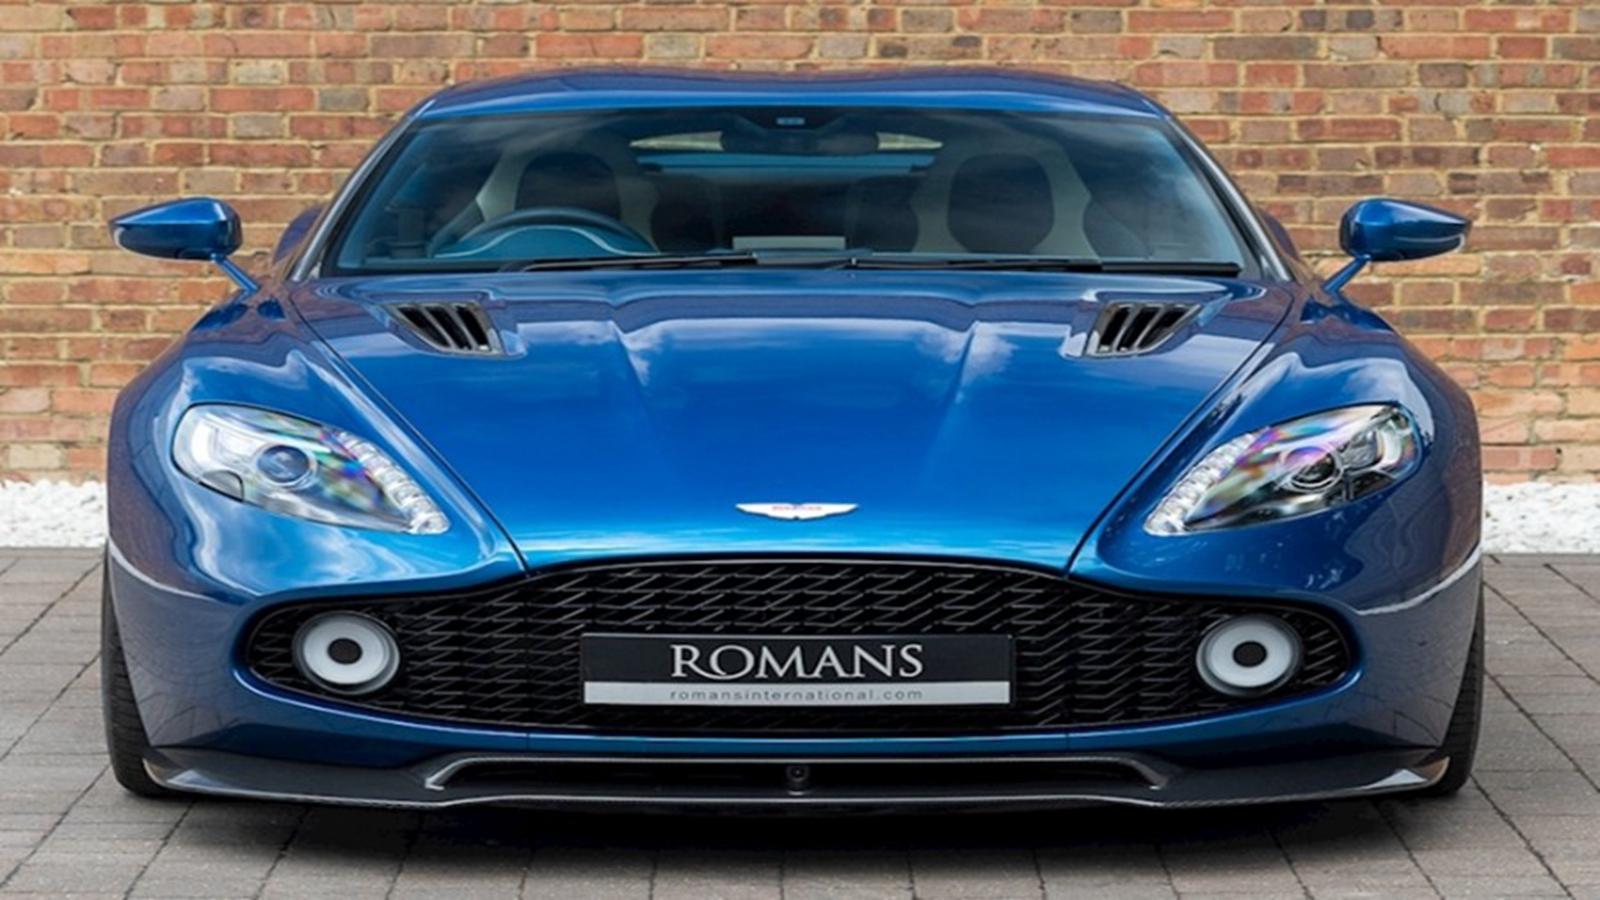 Aston Martin Vanquish Ultimate Gt Images Interior Exterior Photo Gallery Wapcar